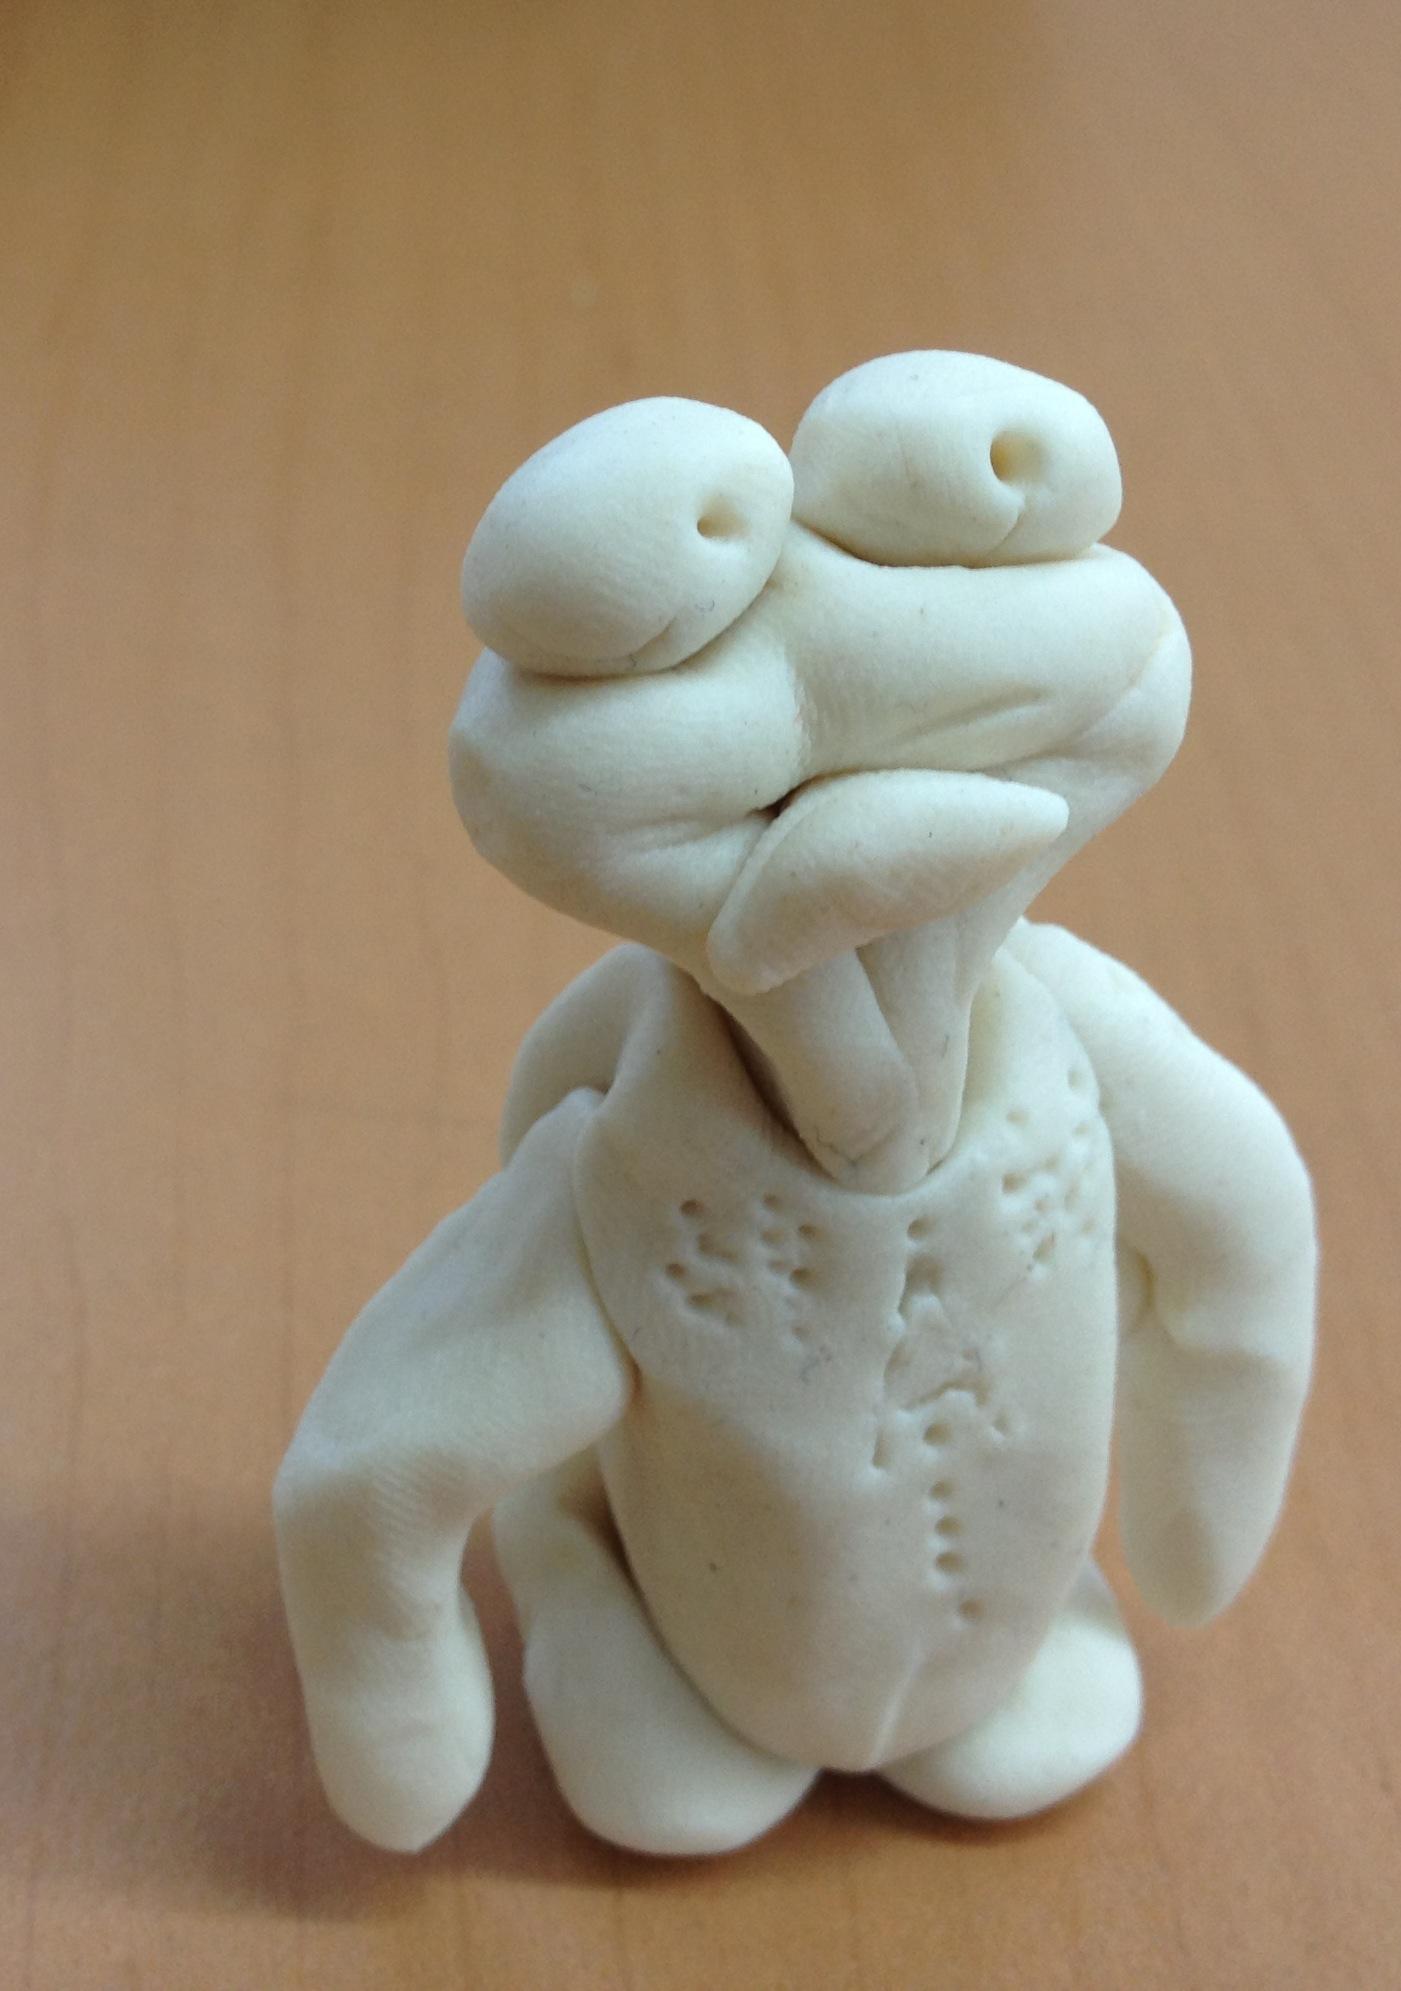 tortuga-decuir-modelo-play-doh